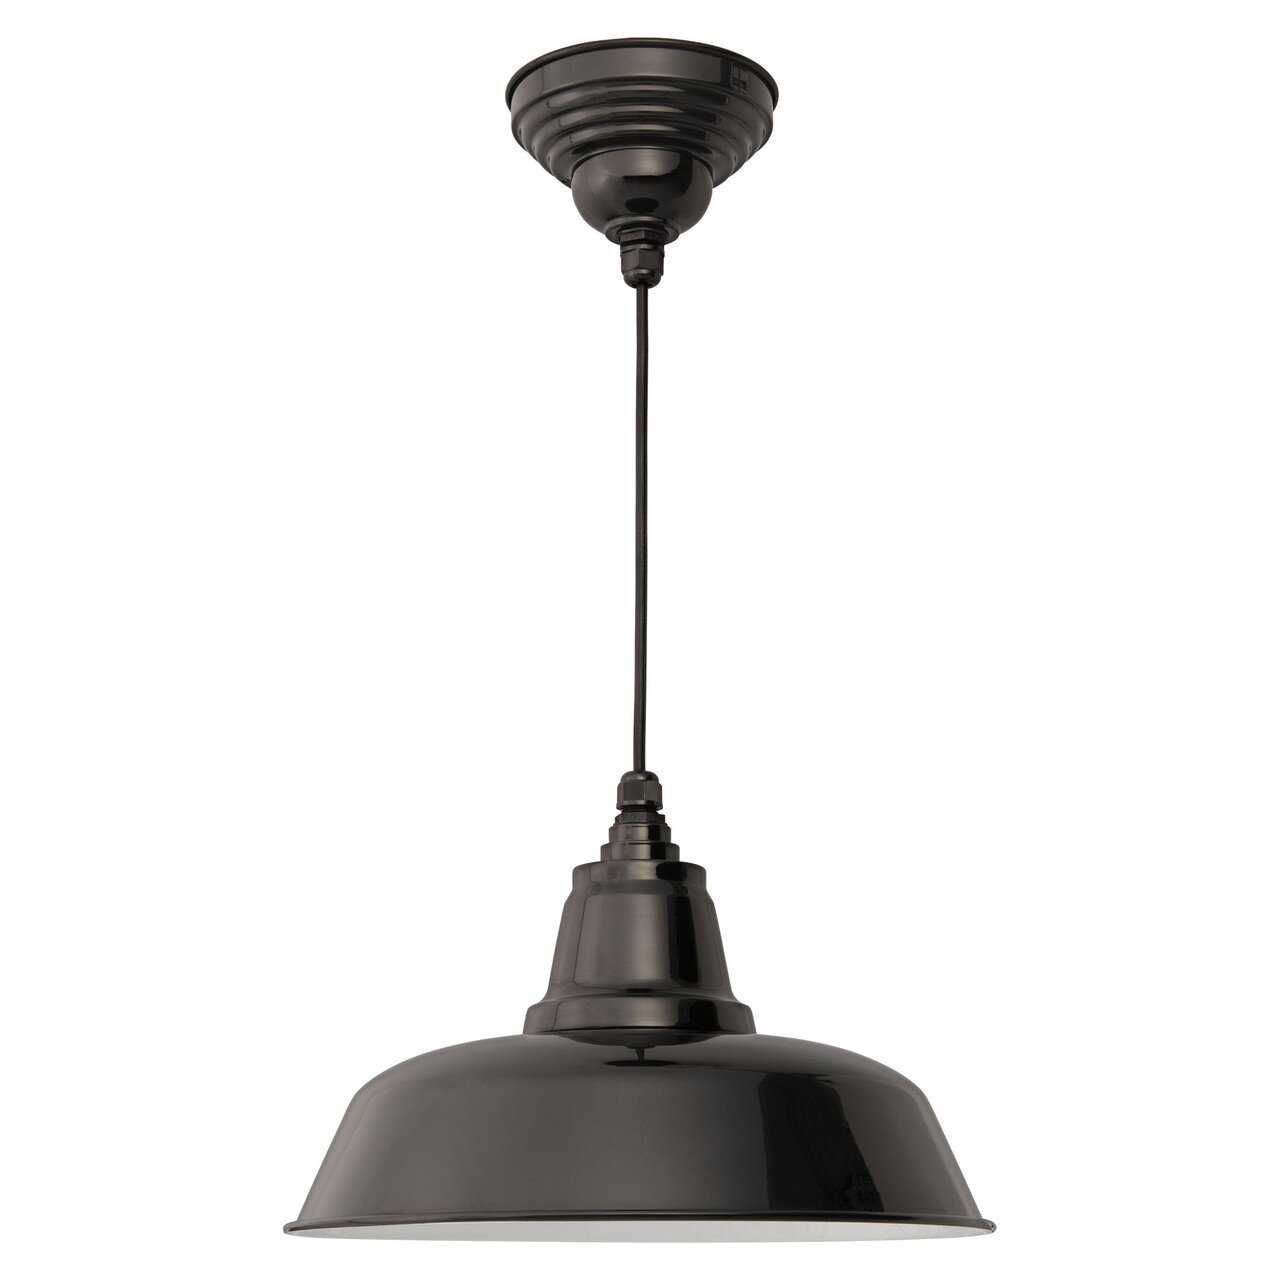 Goodyear 1 Light Outdoor Barn Light: Cocoweb Goodyear 1 Light Bowl Pendant & Reviews